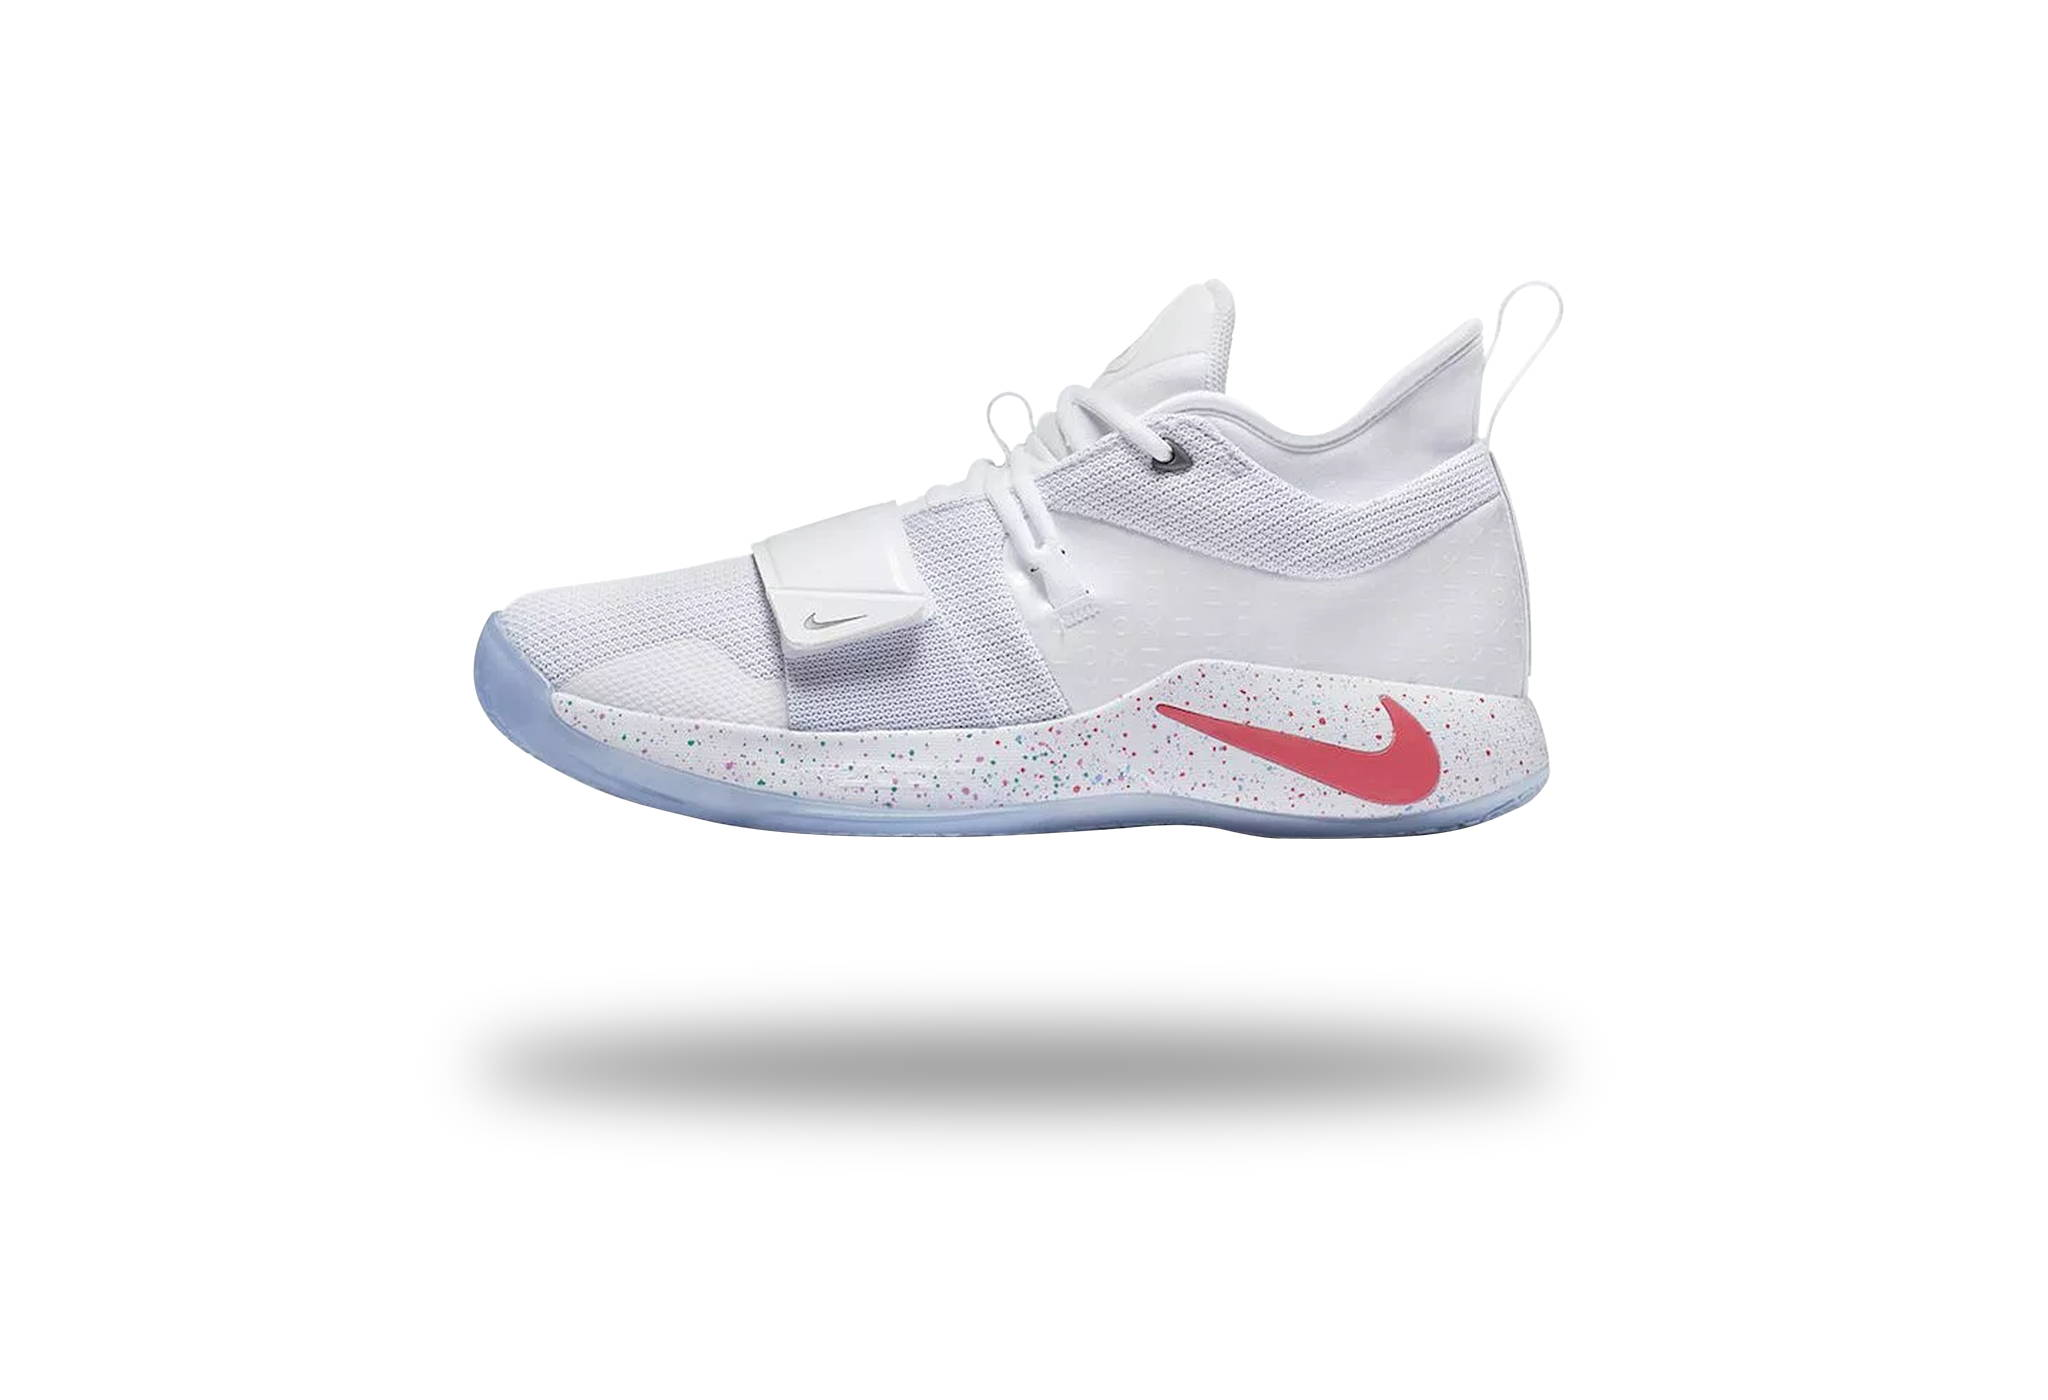 0161b115fb5 Playstation x Nike PG 2.5 – Rsvp Kingz